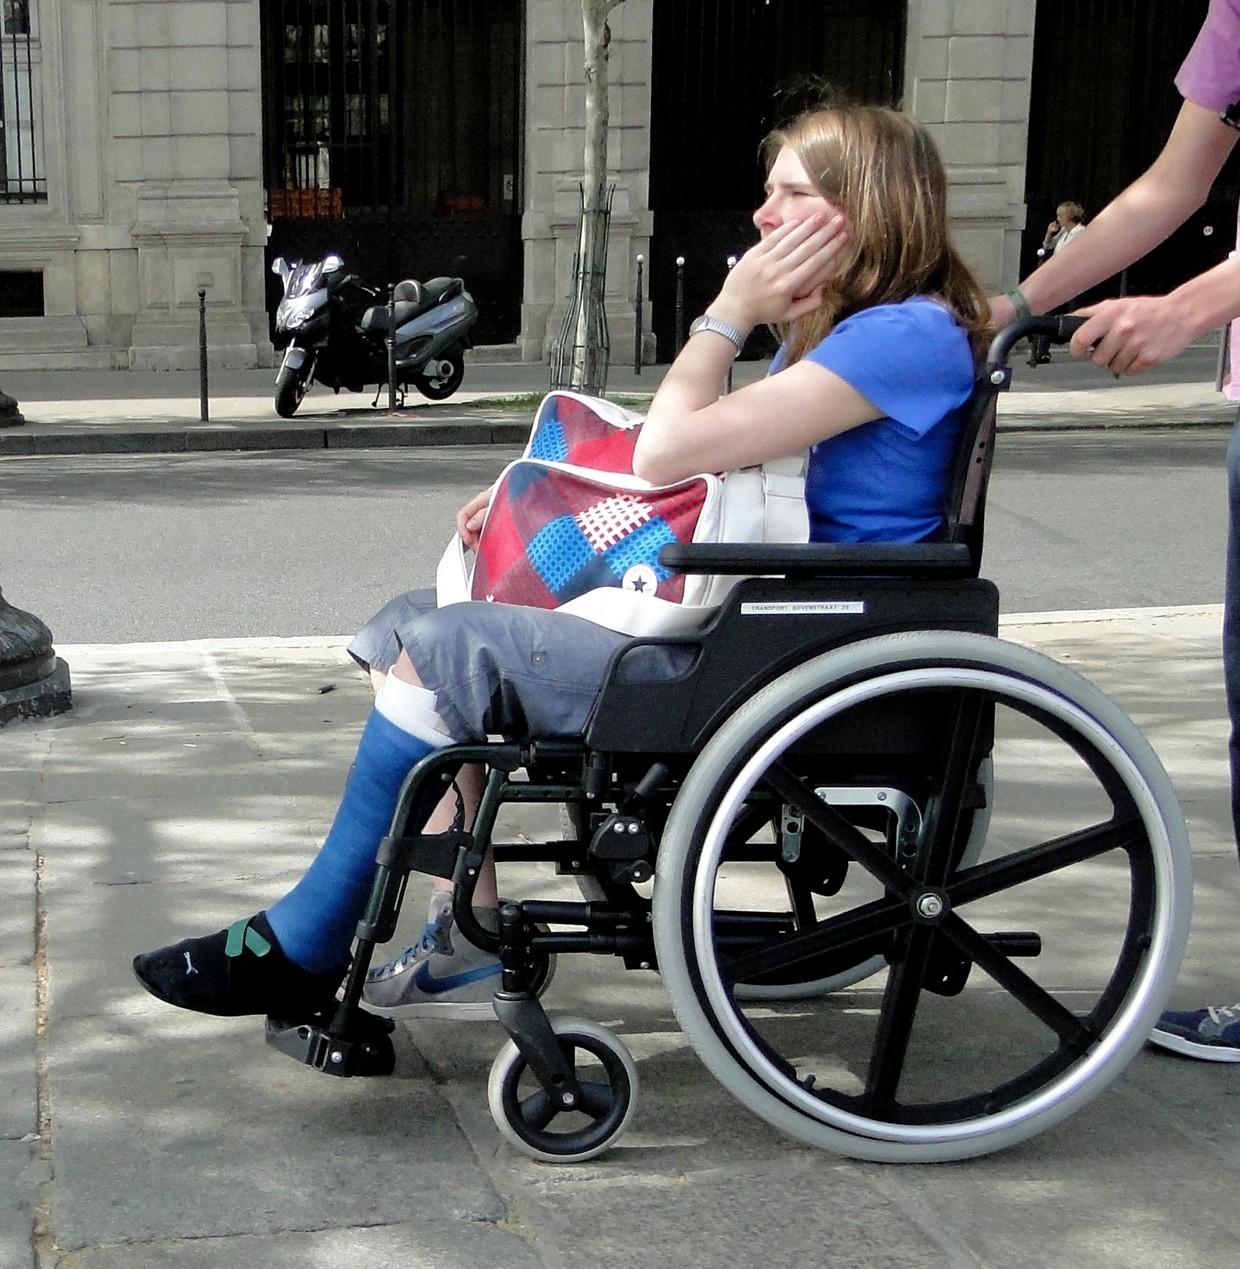 Woman with blue short legcast in wheelchair